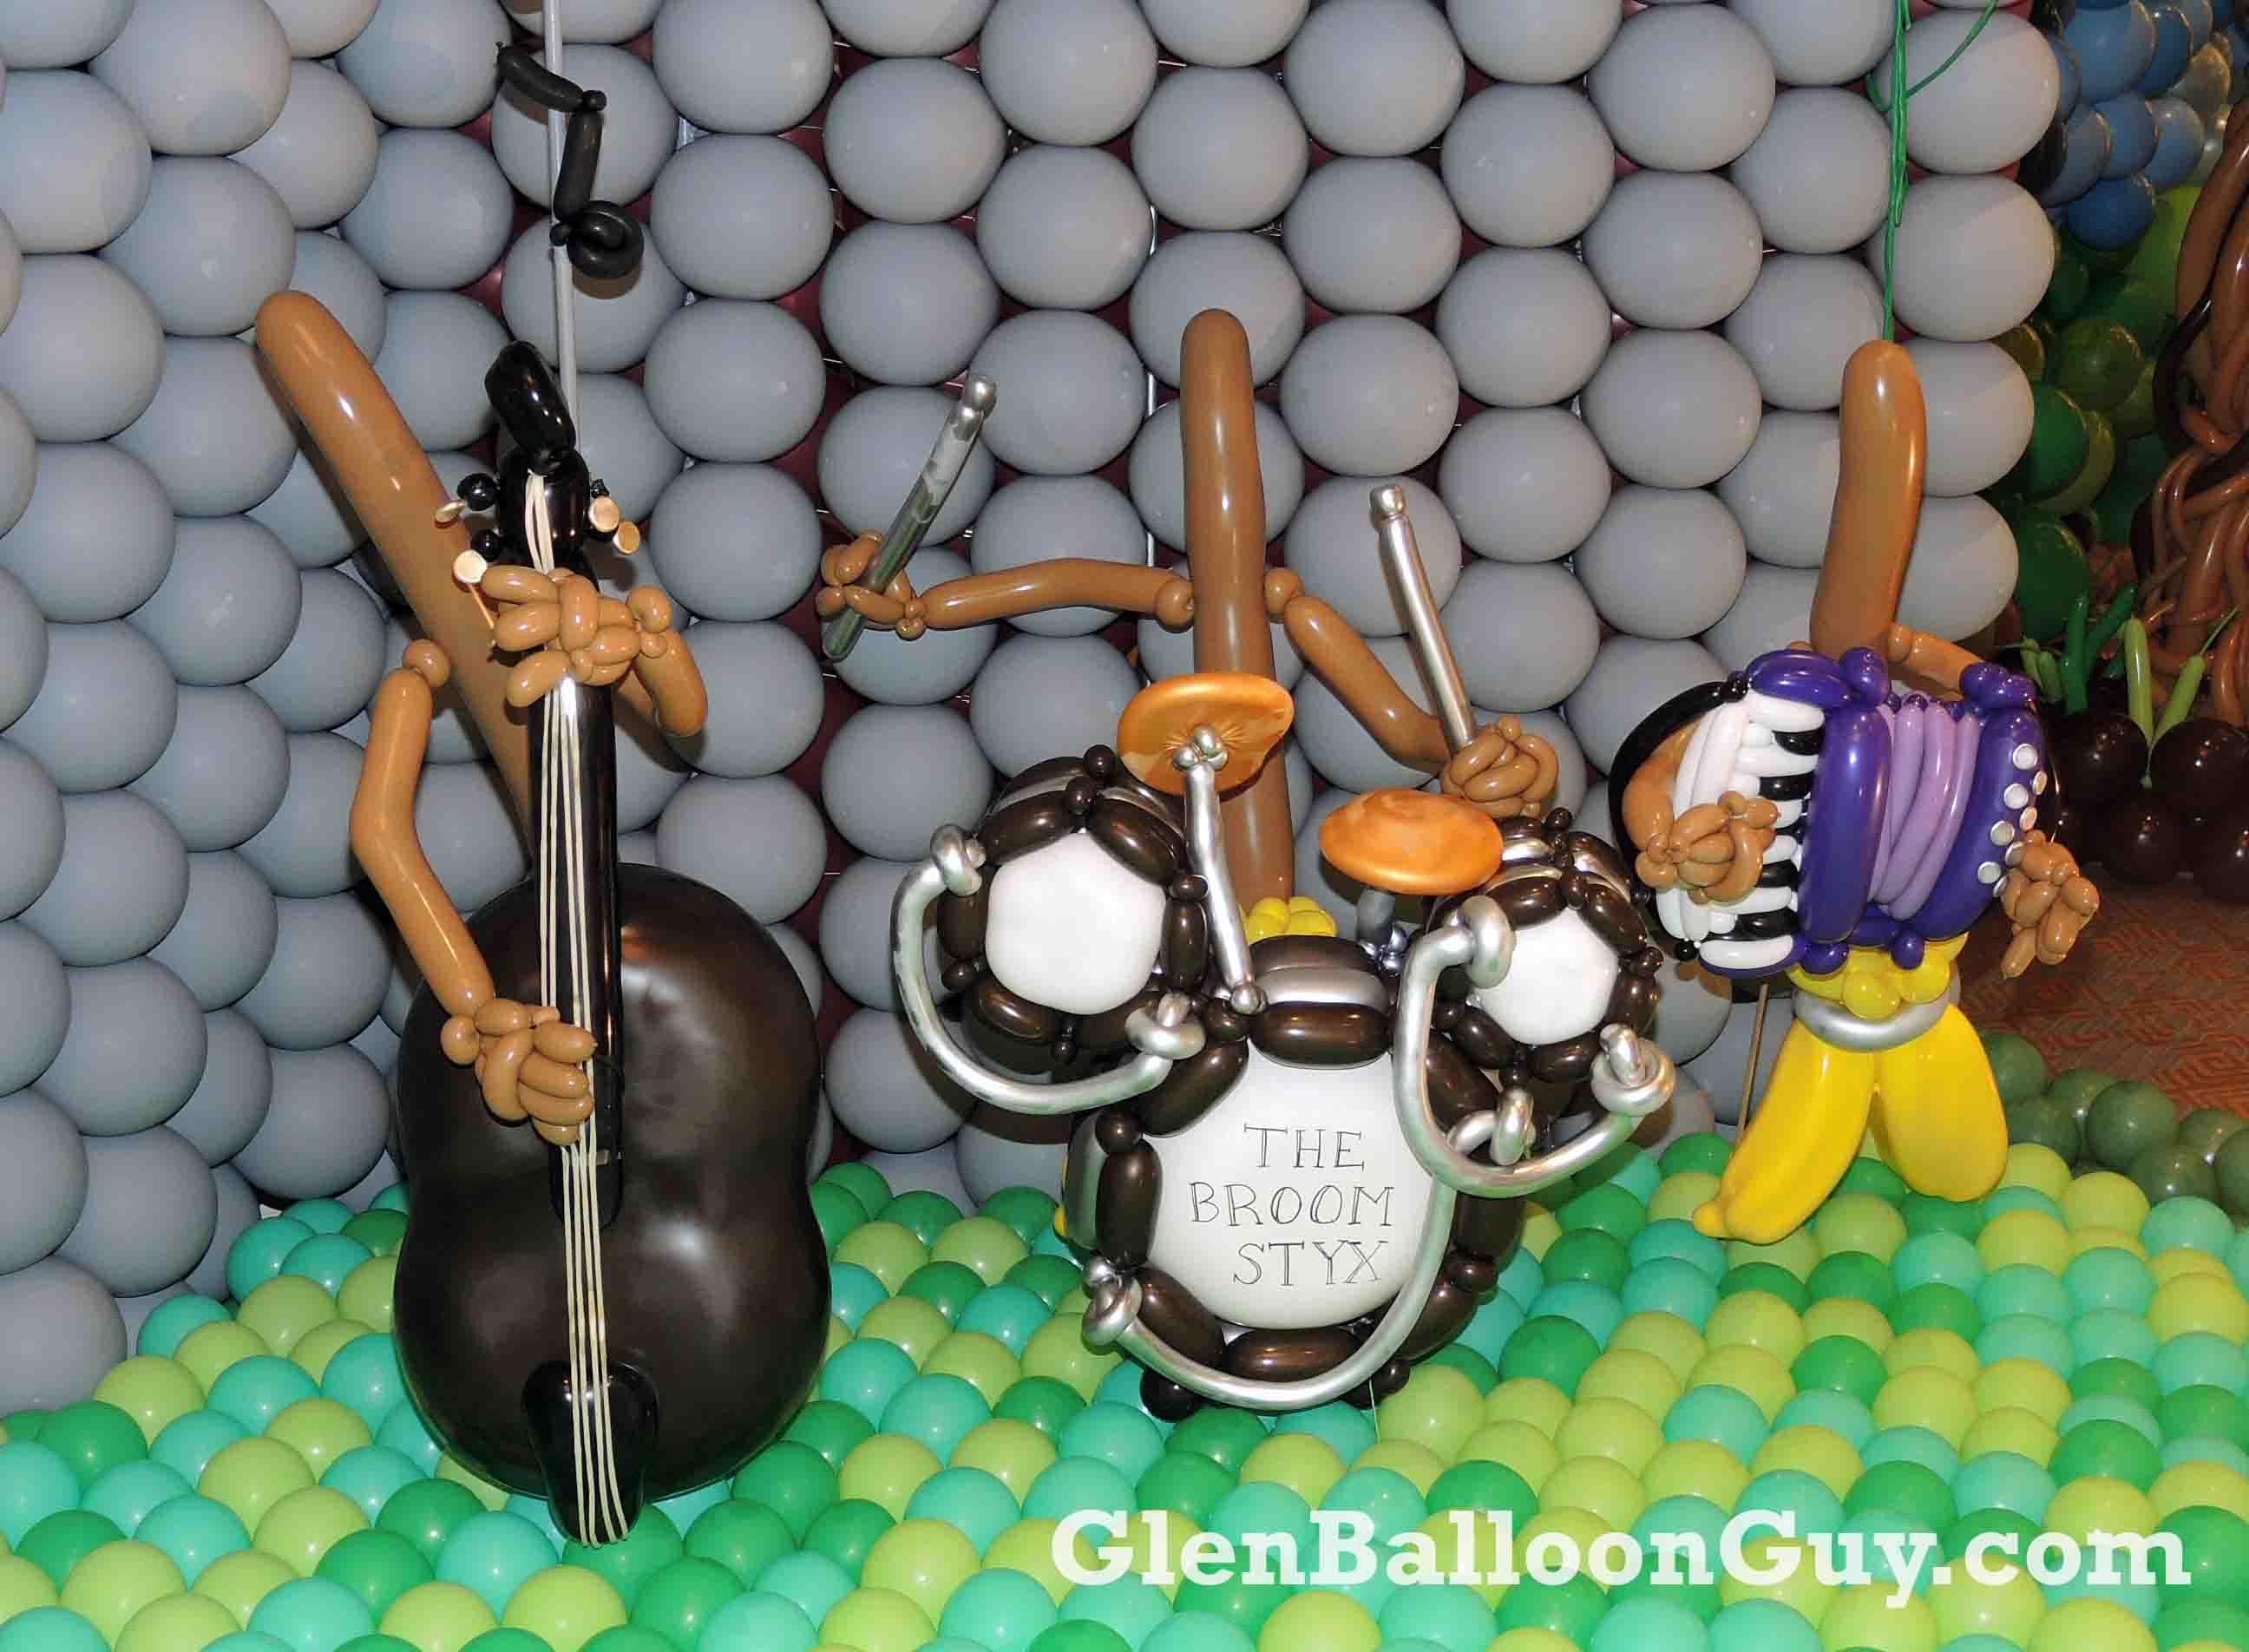 BroomStix Band